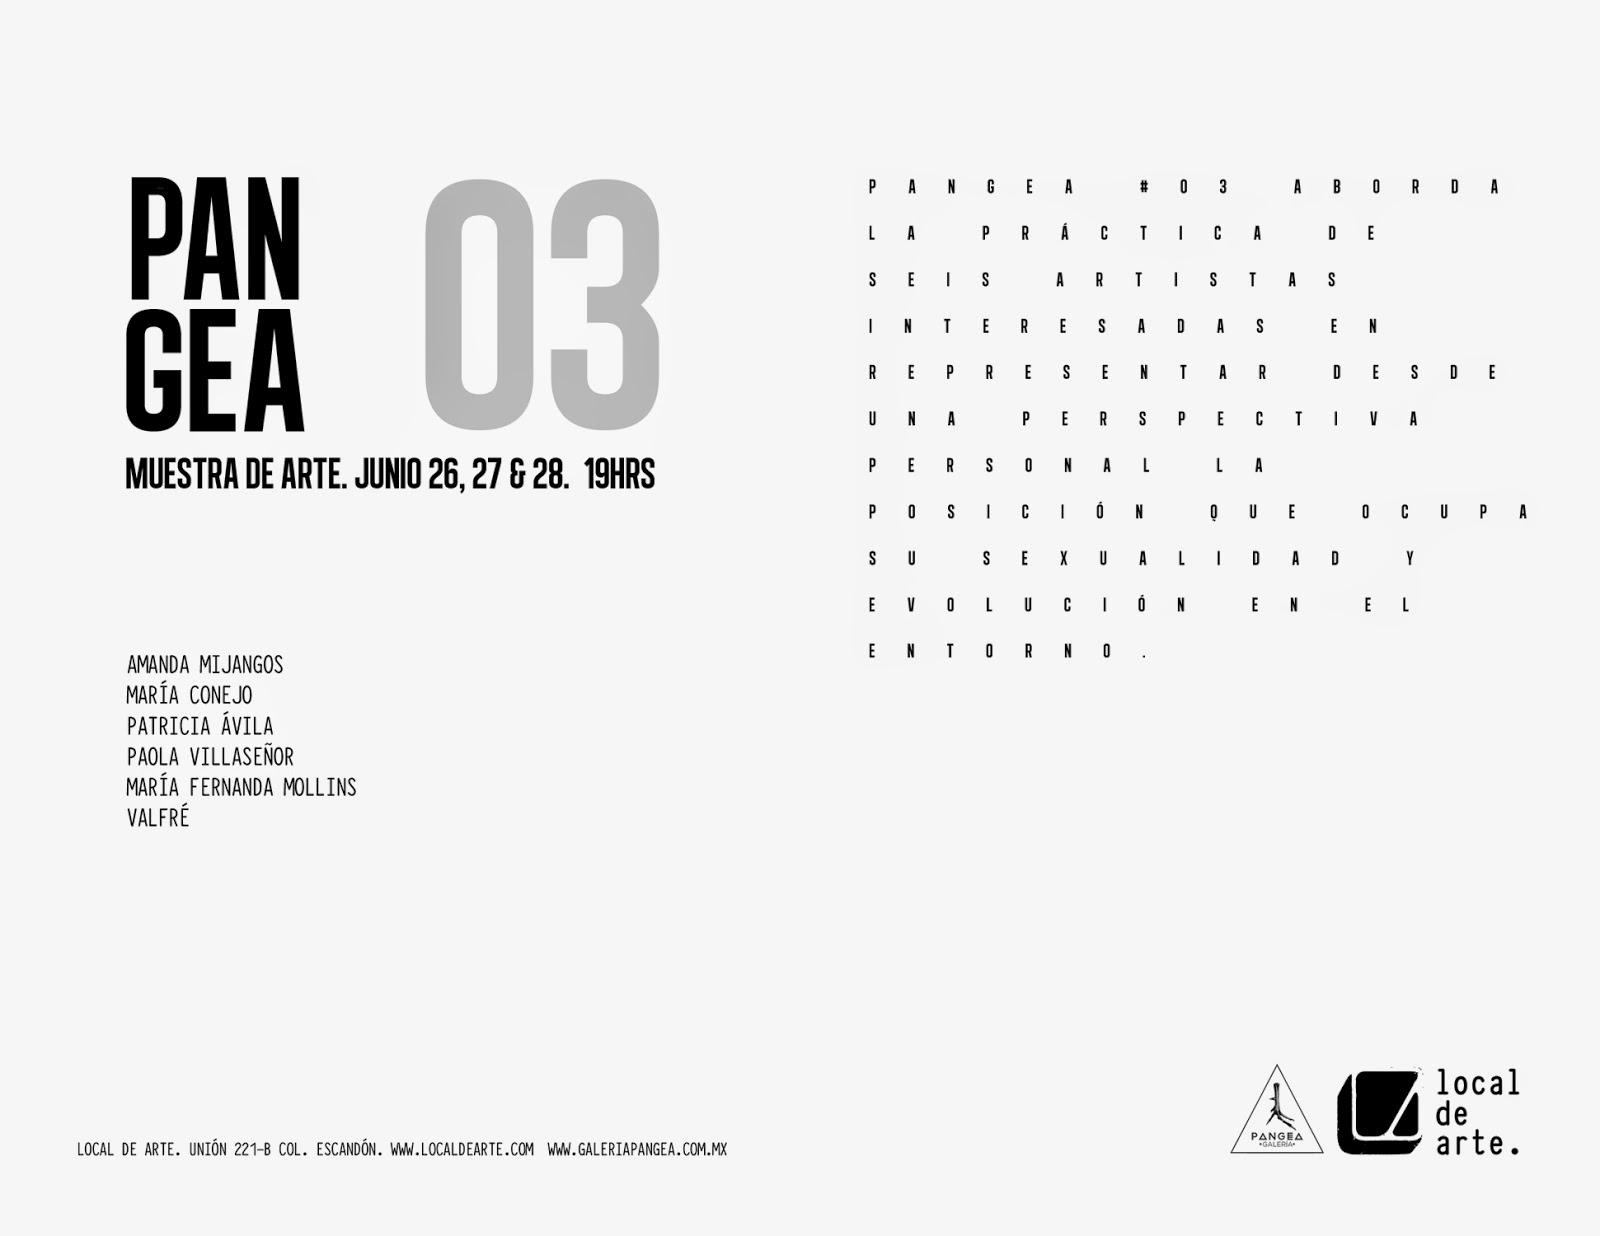 Muestra de Arte PANGEA 03 en Local de Arte